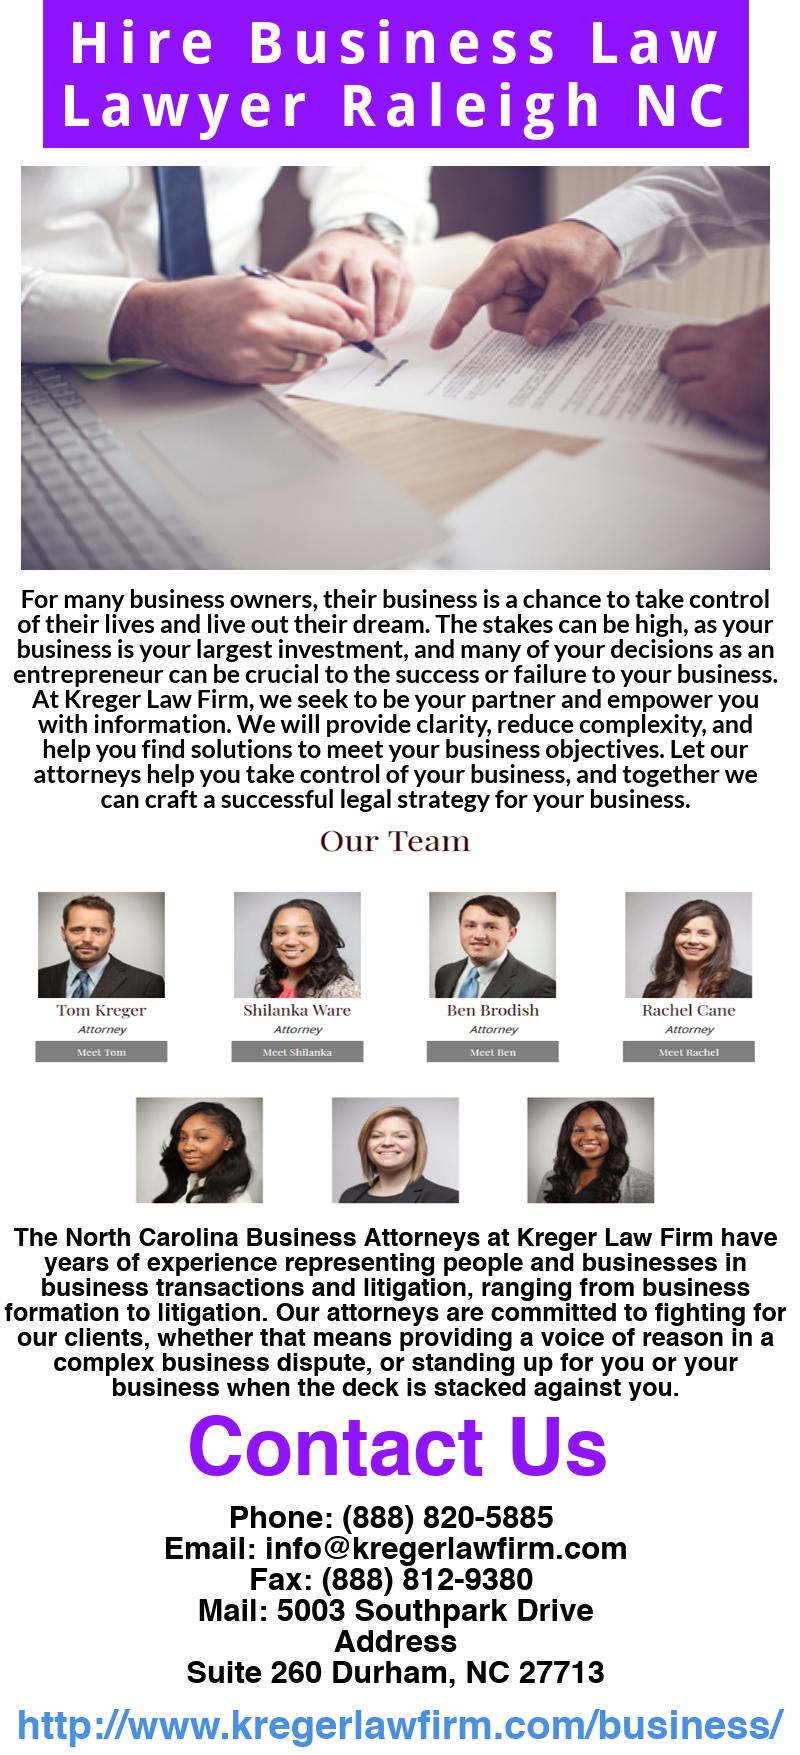 Pin de kreger lawfirm en Need Business Law Lawyer Raleigh NC